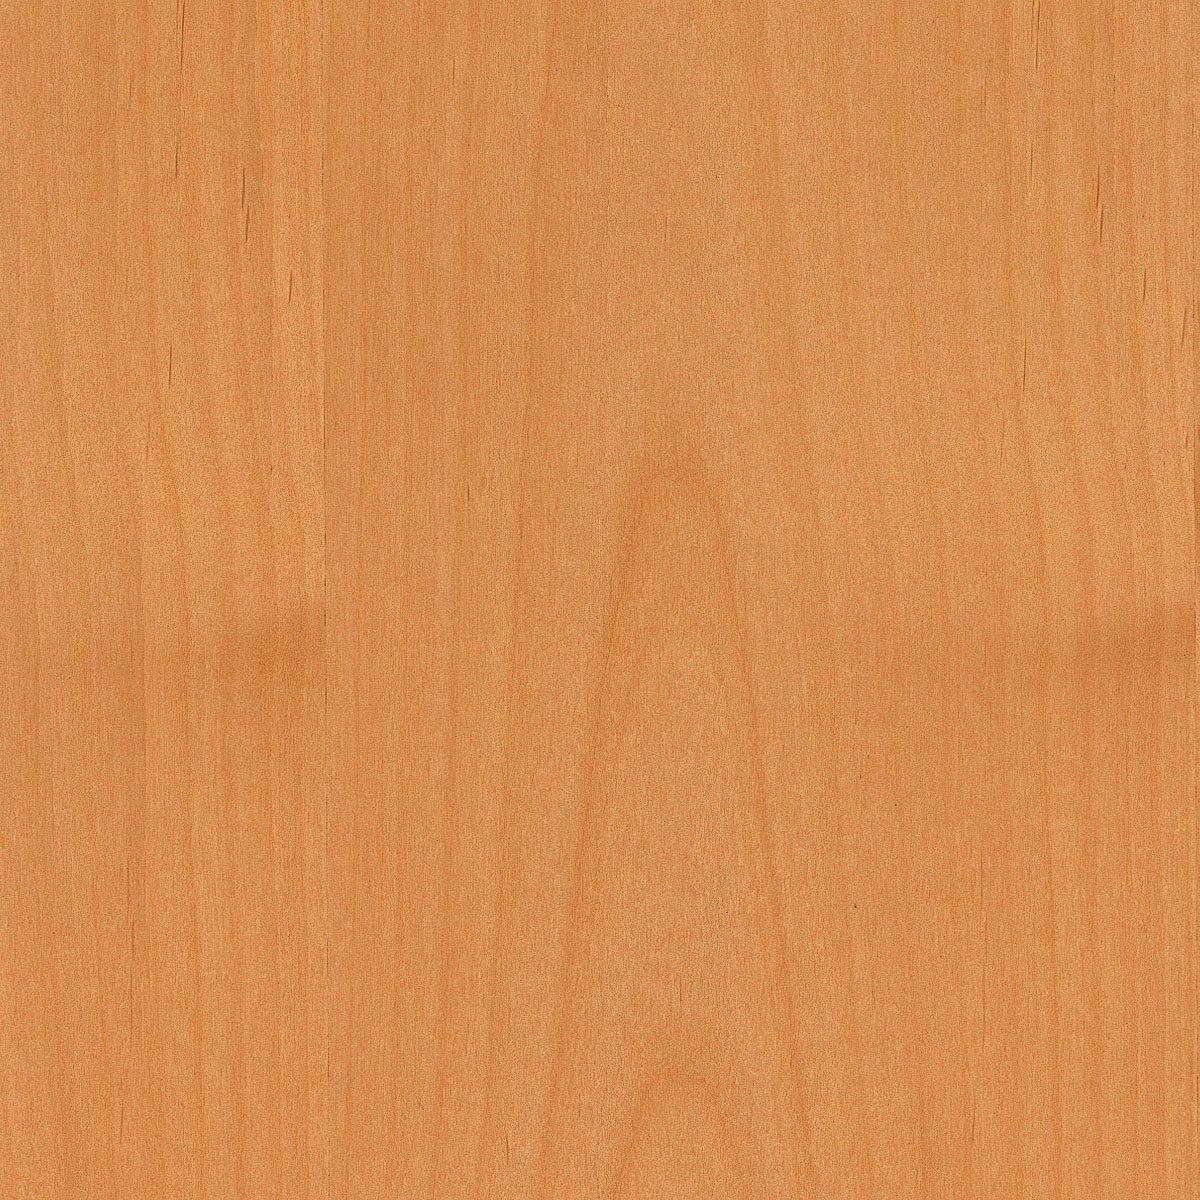 Alder Clear Wood Veneer 2'X8' PSA(Peel and Stick) 468 Sheet Wood-All